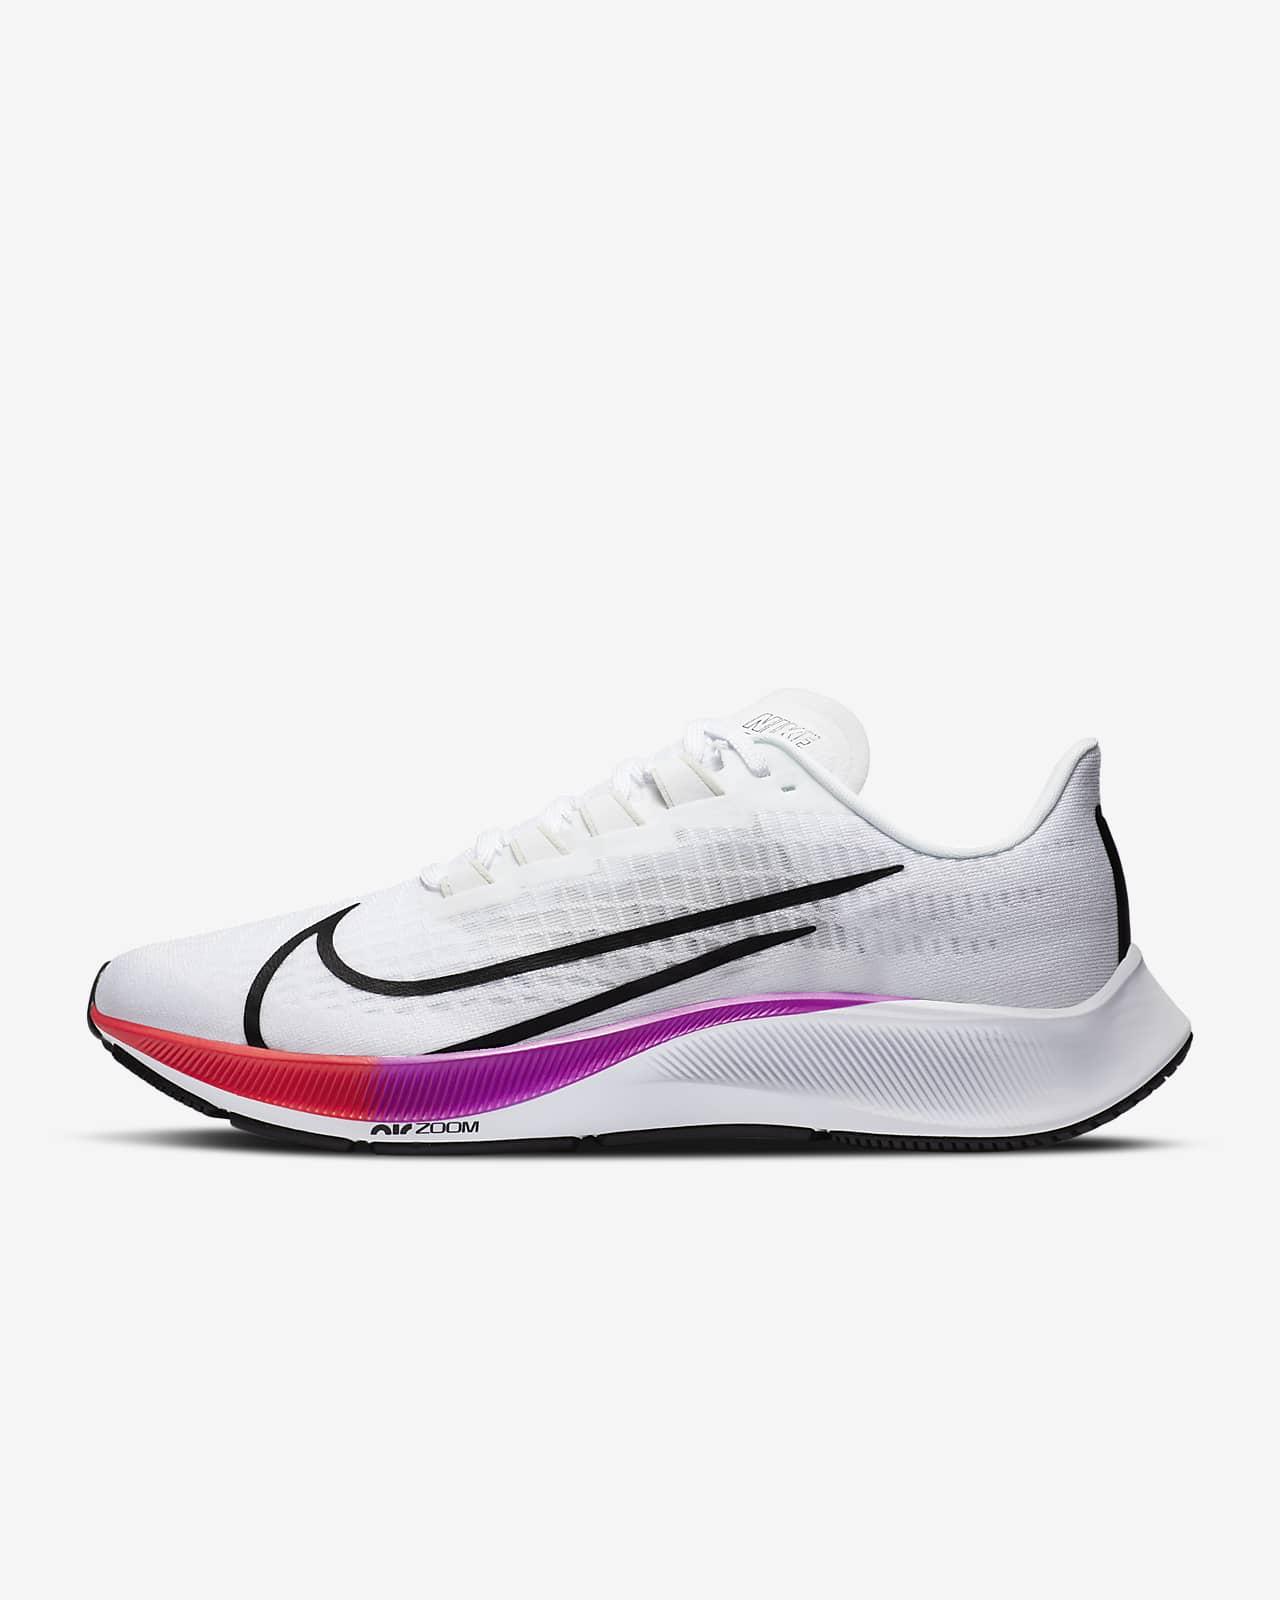 Sapatilhas de running Nike Air Zoom Pegasus 37 para homem